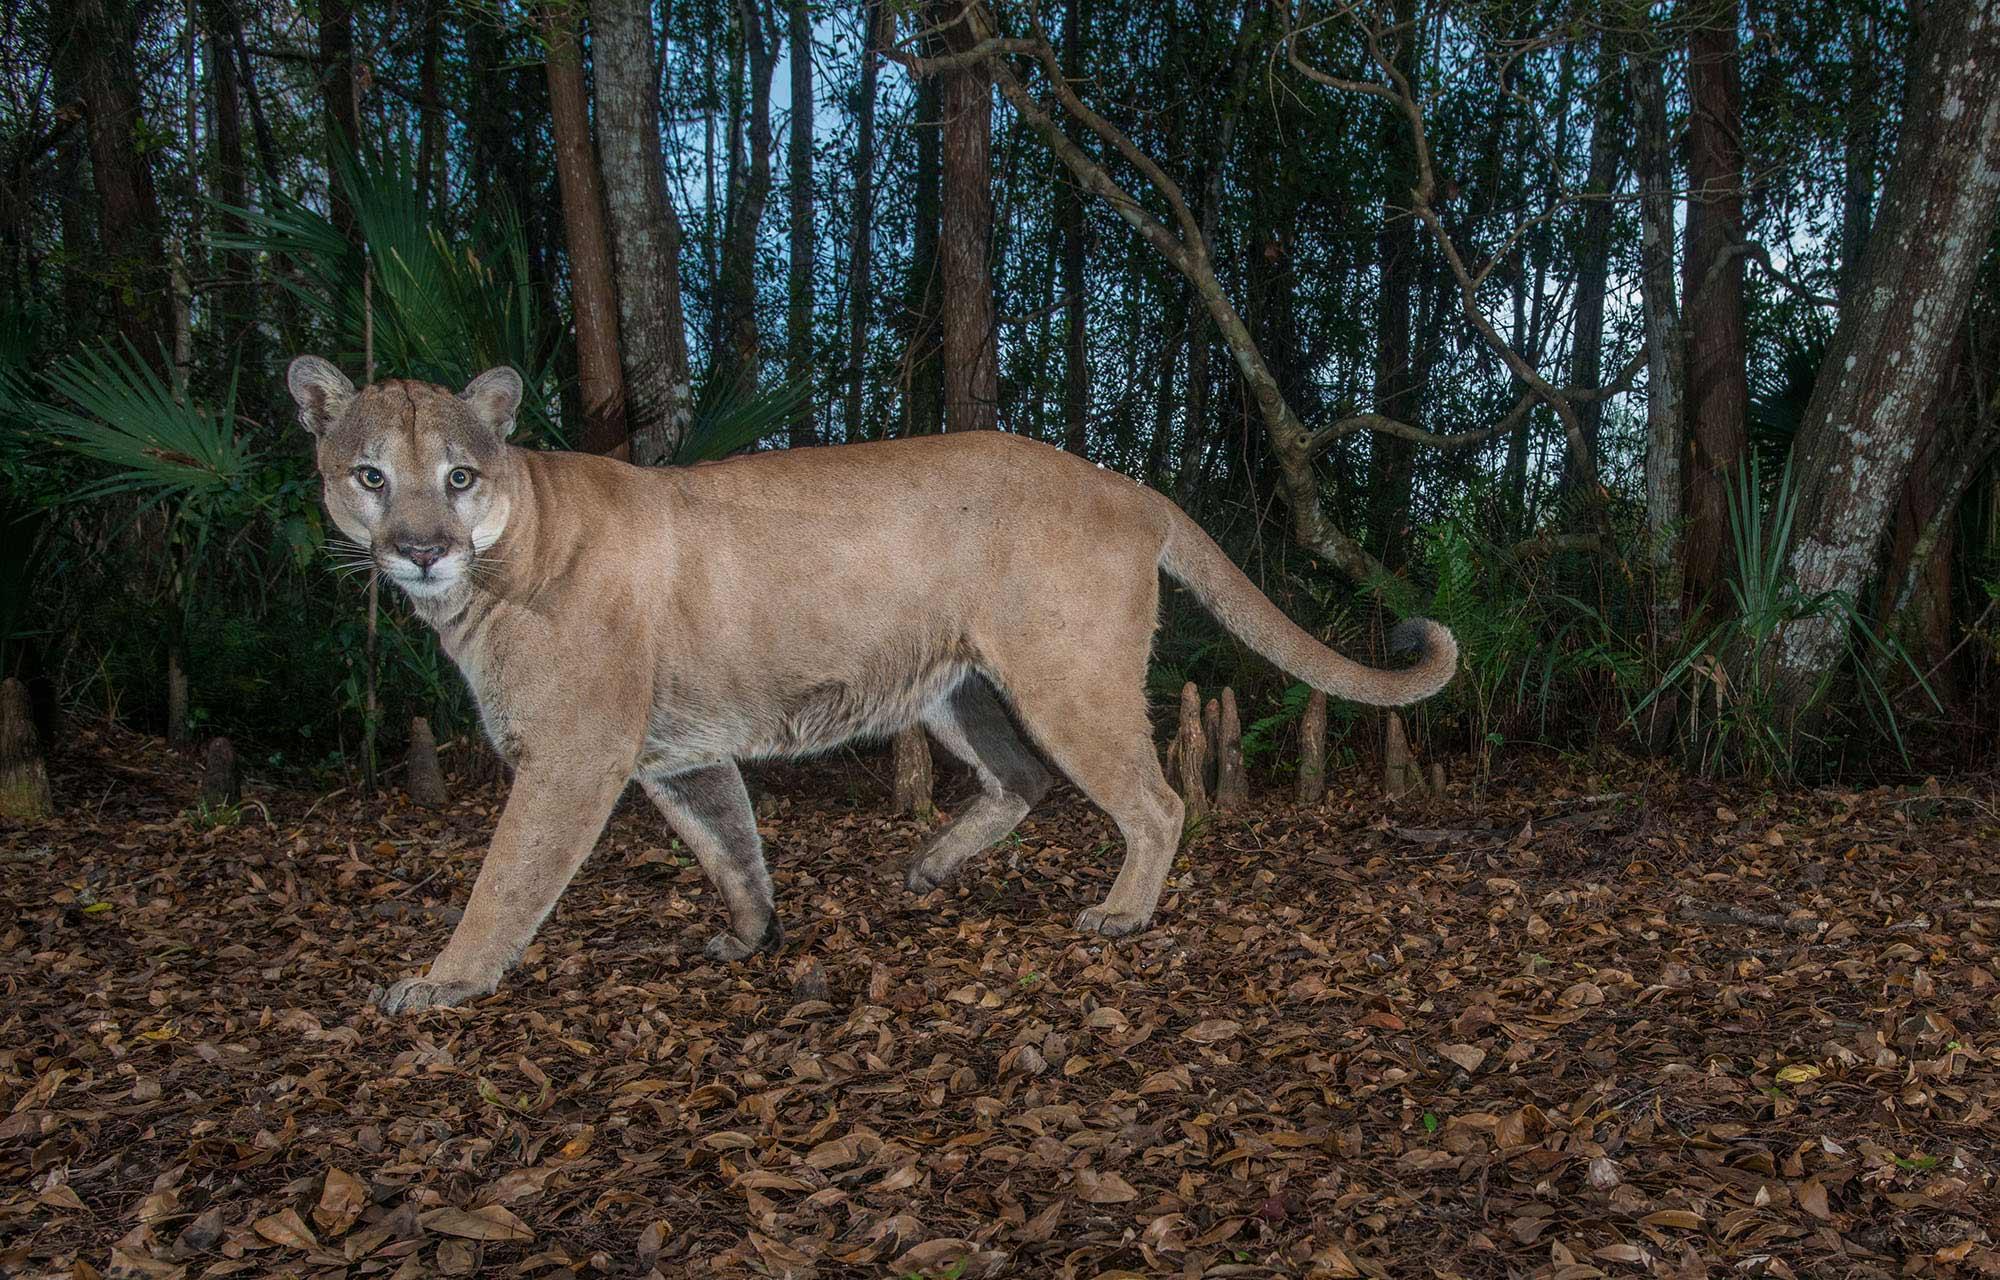 panther inBagdara Wildlife Sanctuary